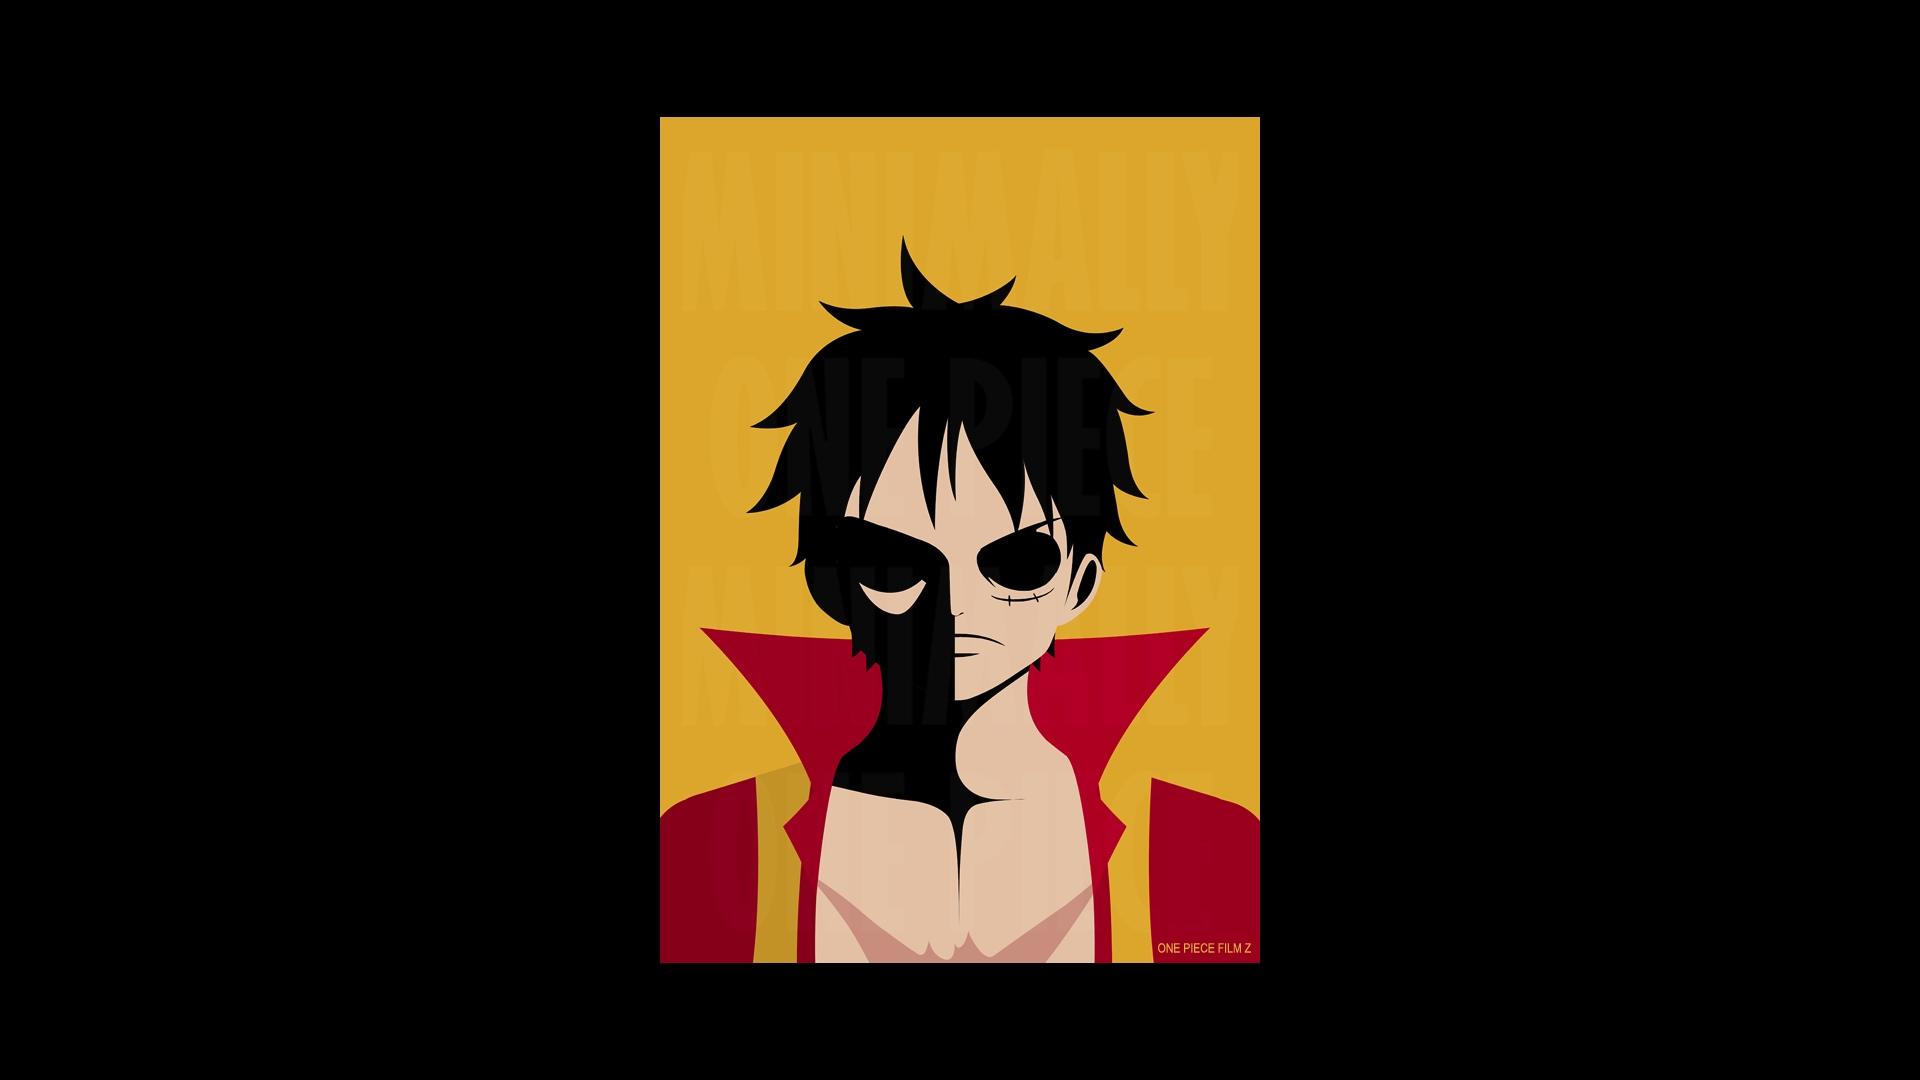 Desktop Wallpaper Anime Boy One Piece Monkey D Luffy Hd